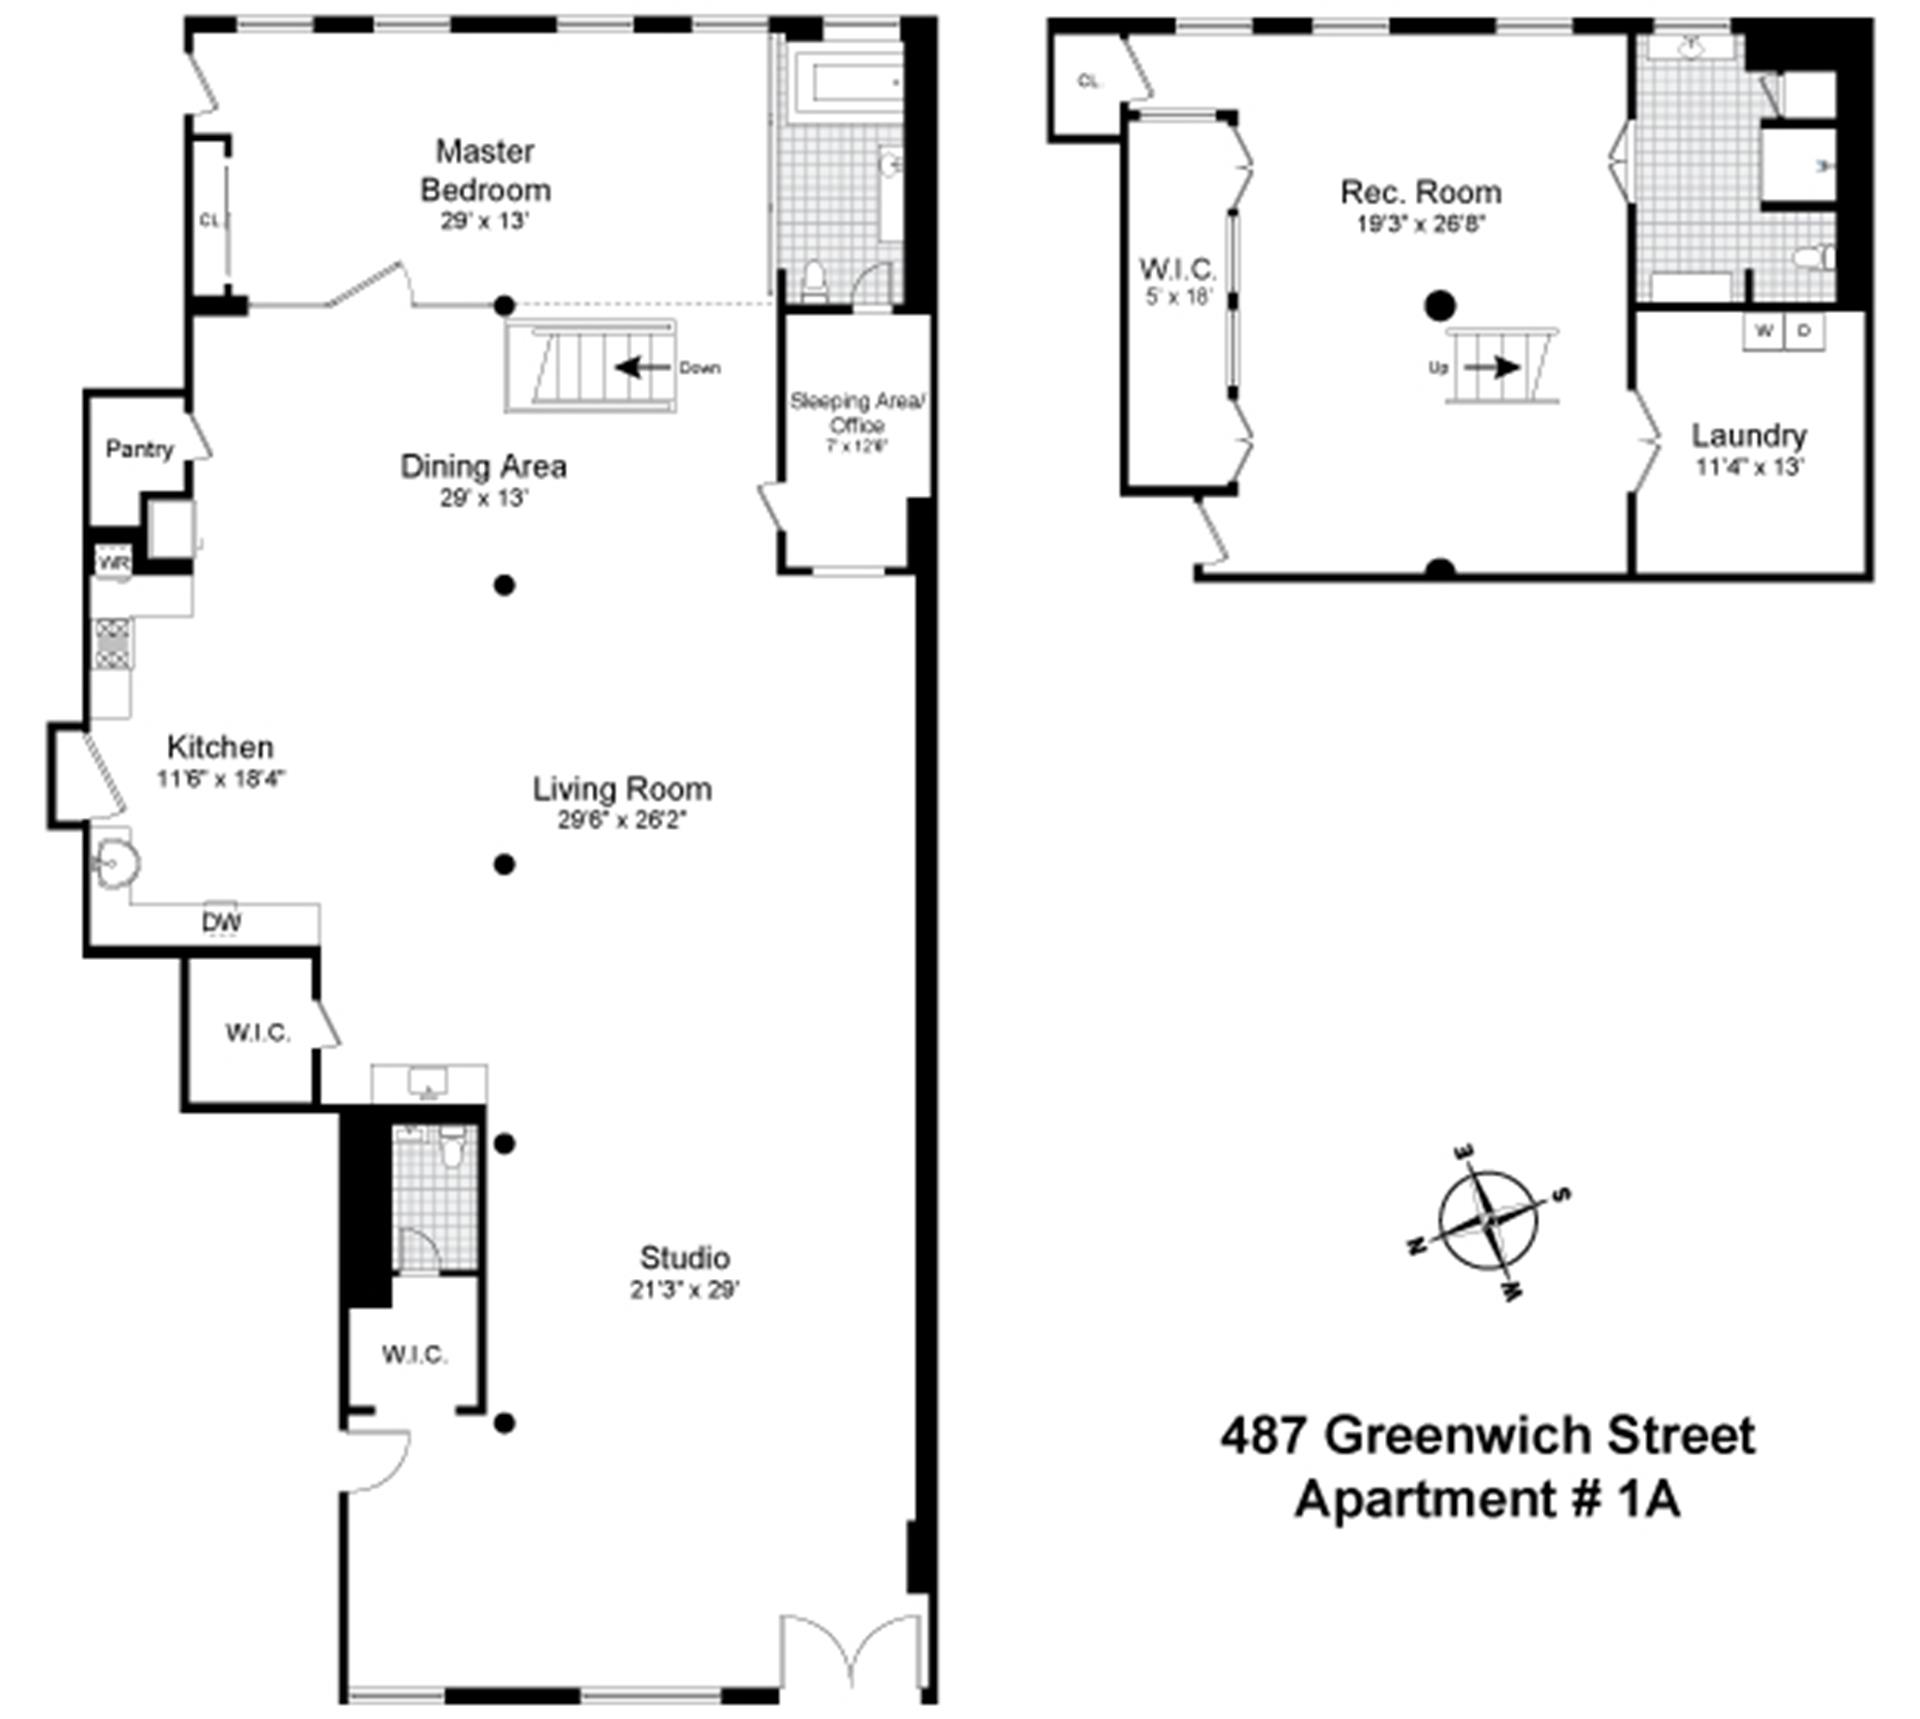 Floor plan of 487 Greenwich St, 1A - SoHo - Nolita, New York